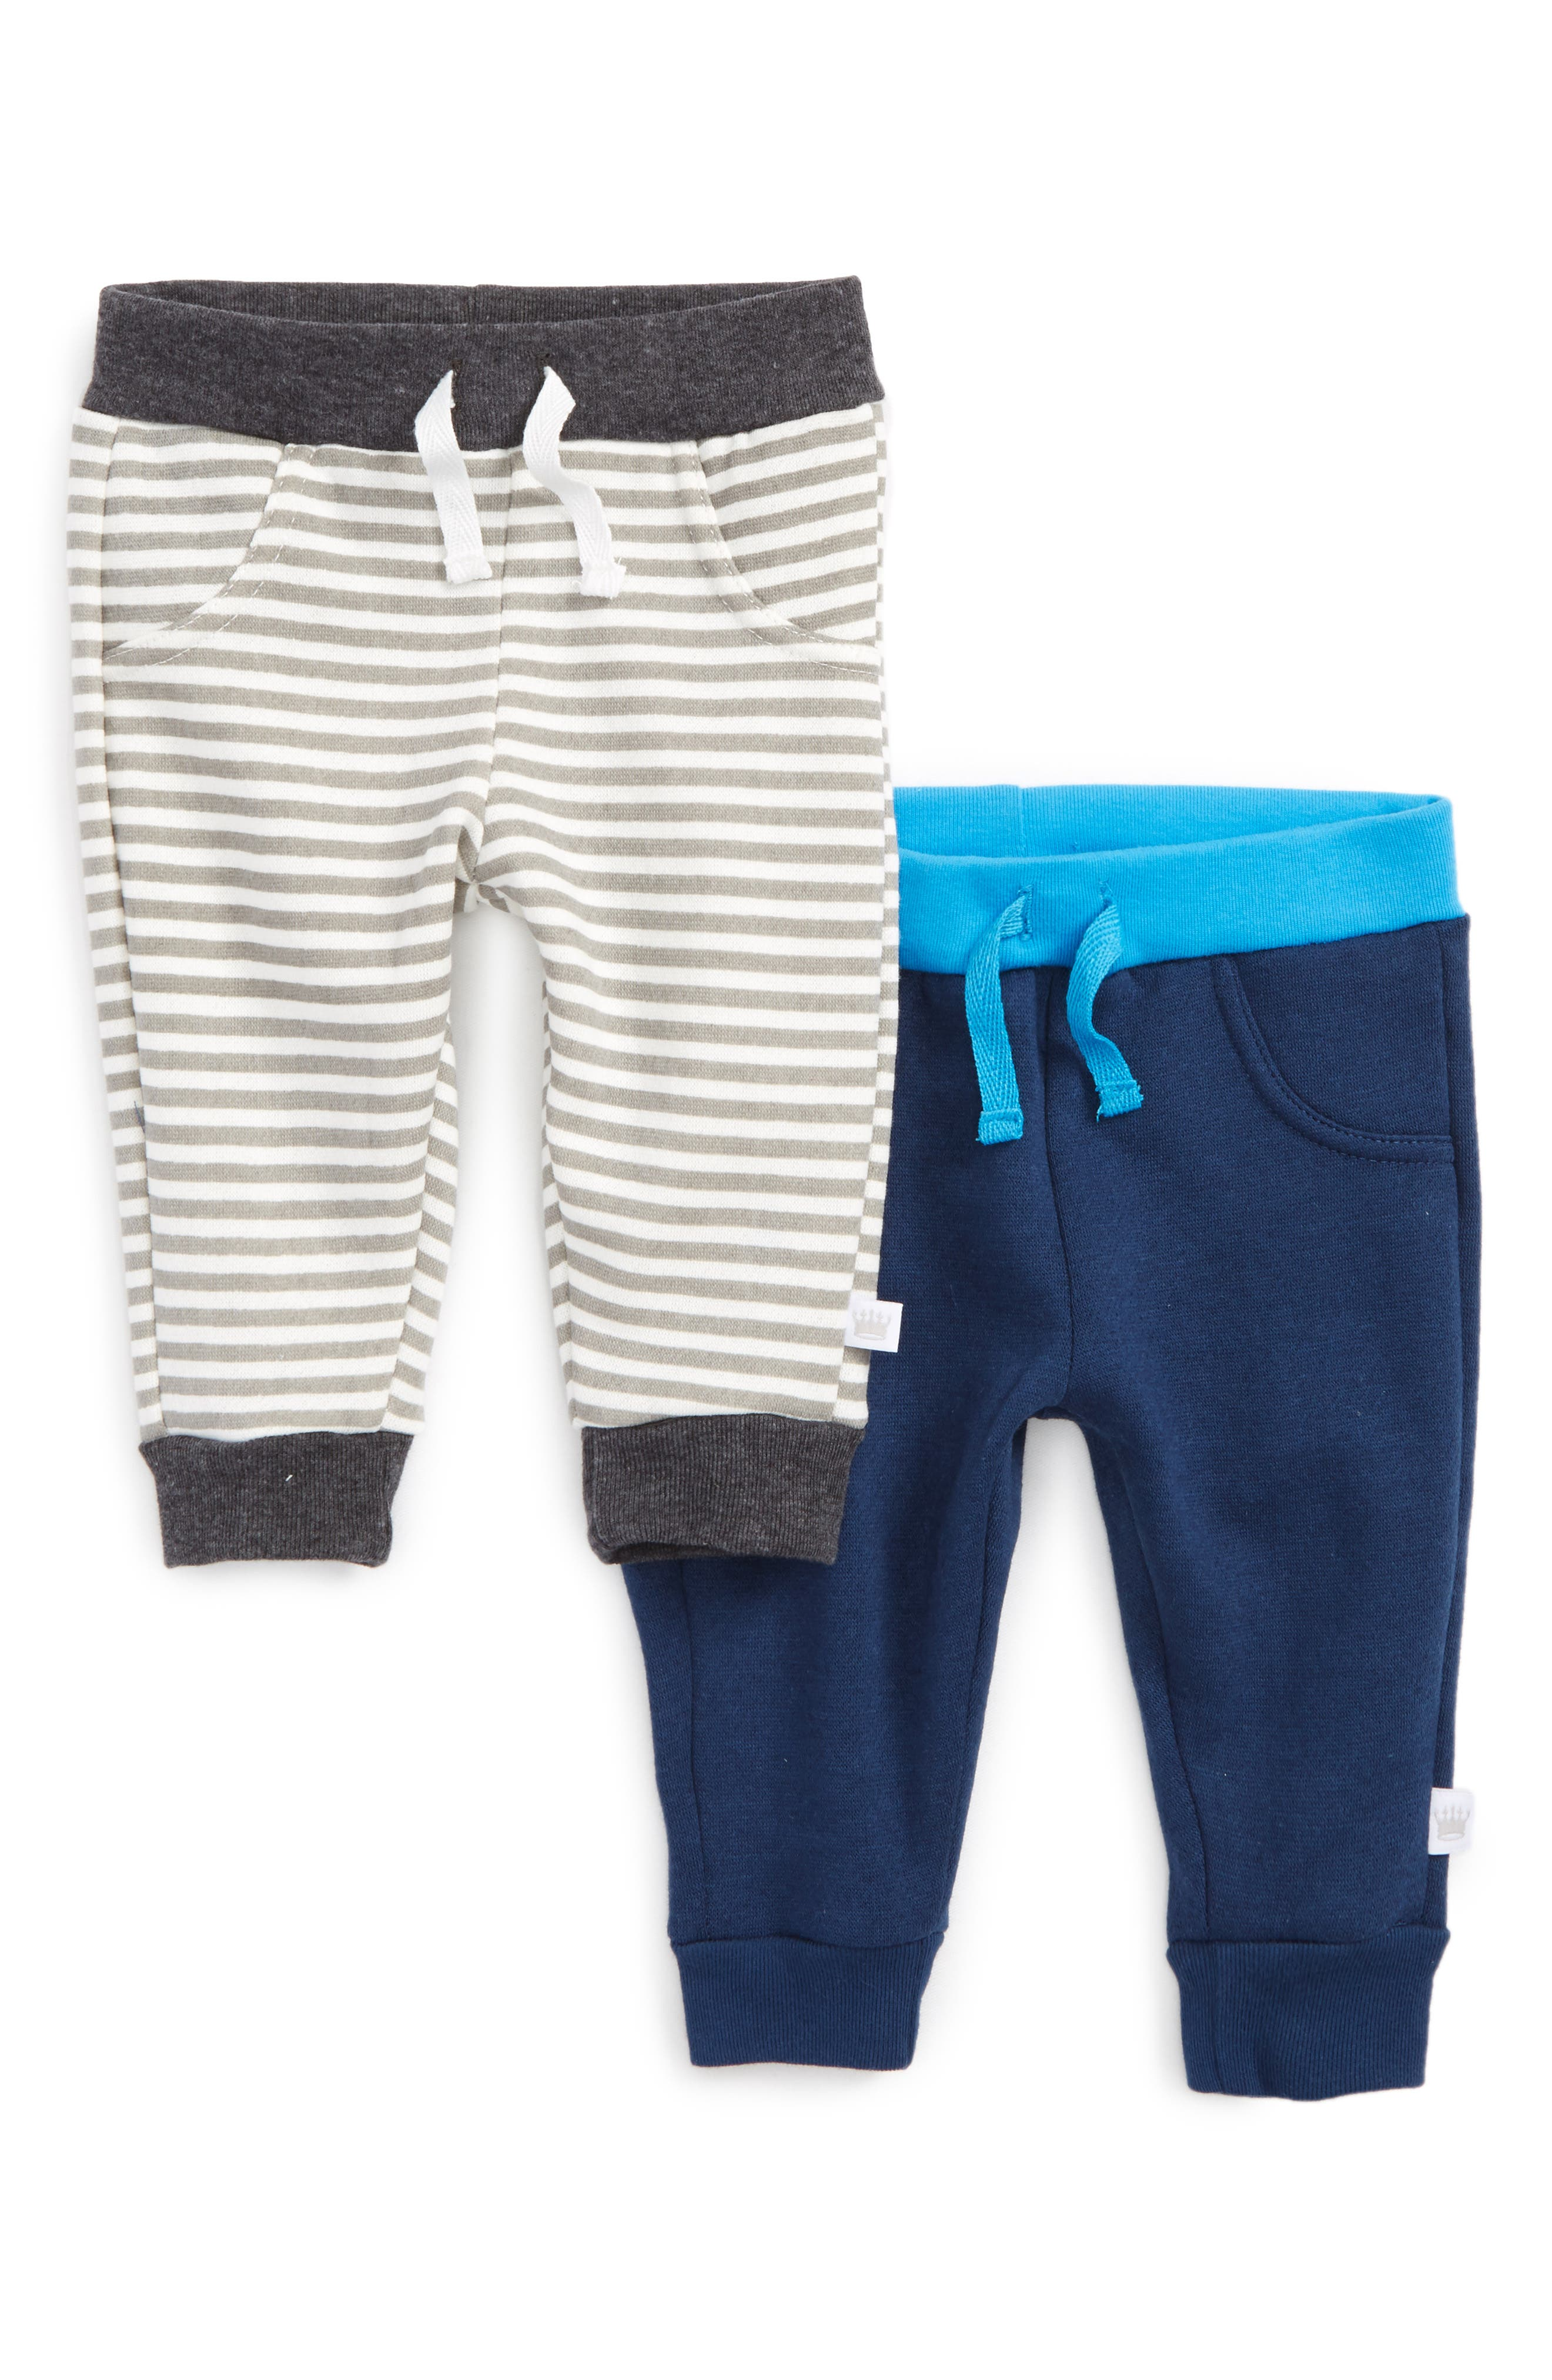 2-Pack Sweatpants,                             Main thumbnail 1, color,                             Blue Multi